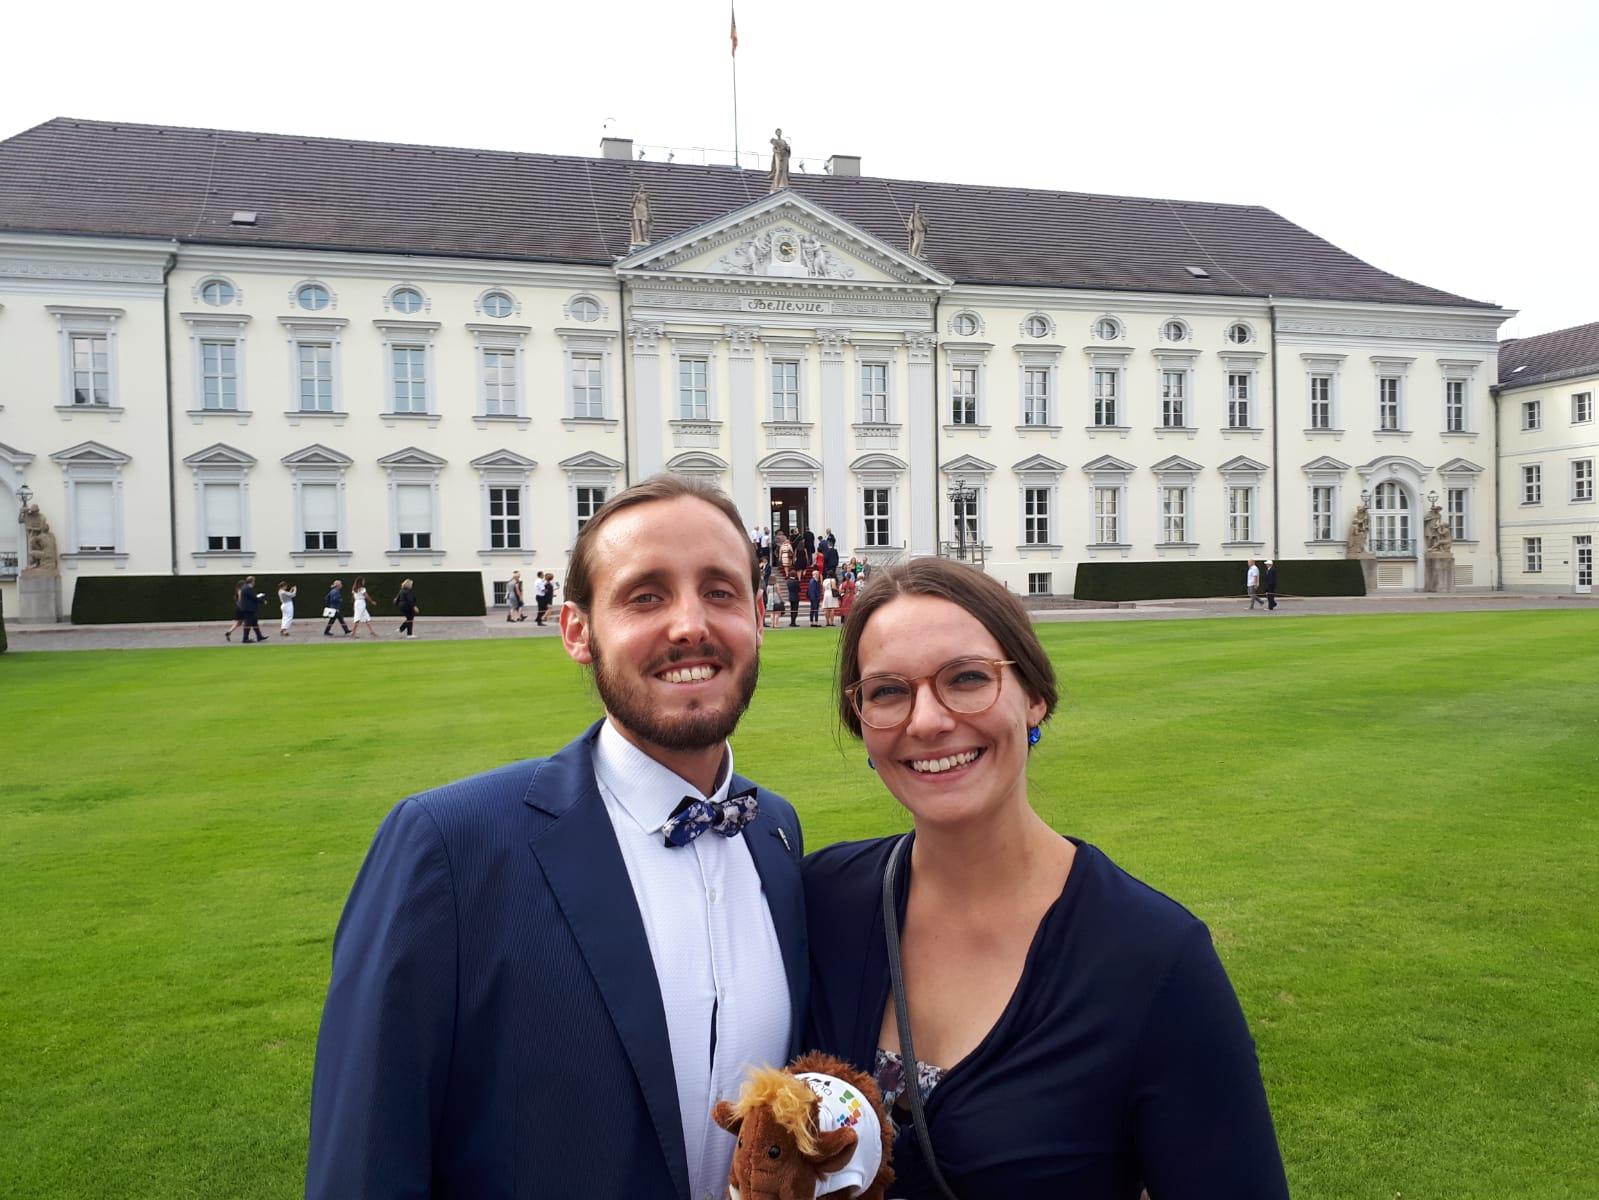 Dominik & Lena beim Bürgerfest des Bundespräsidenten